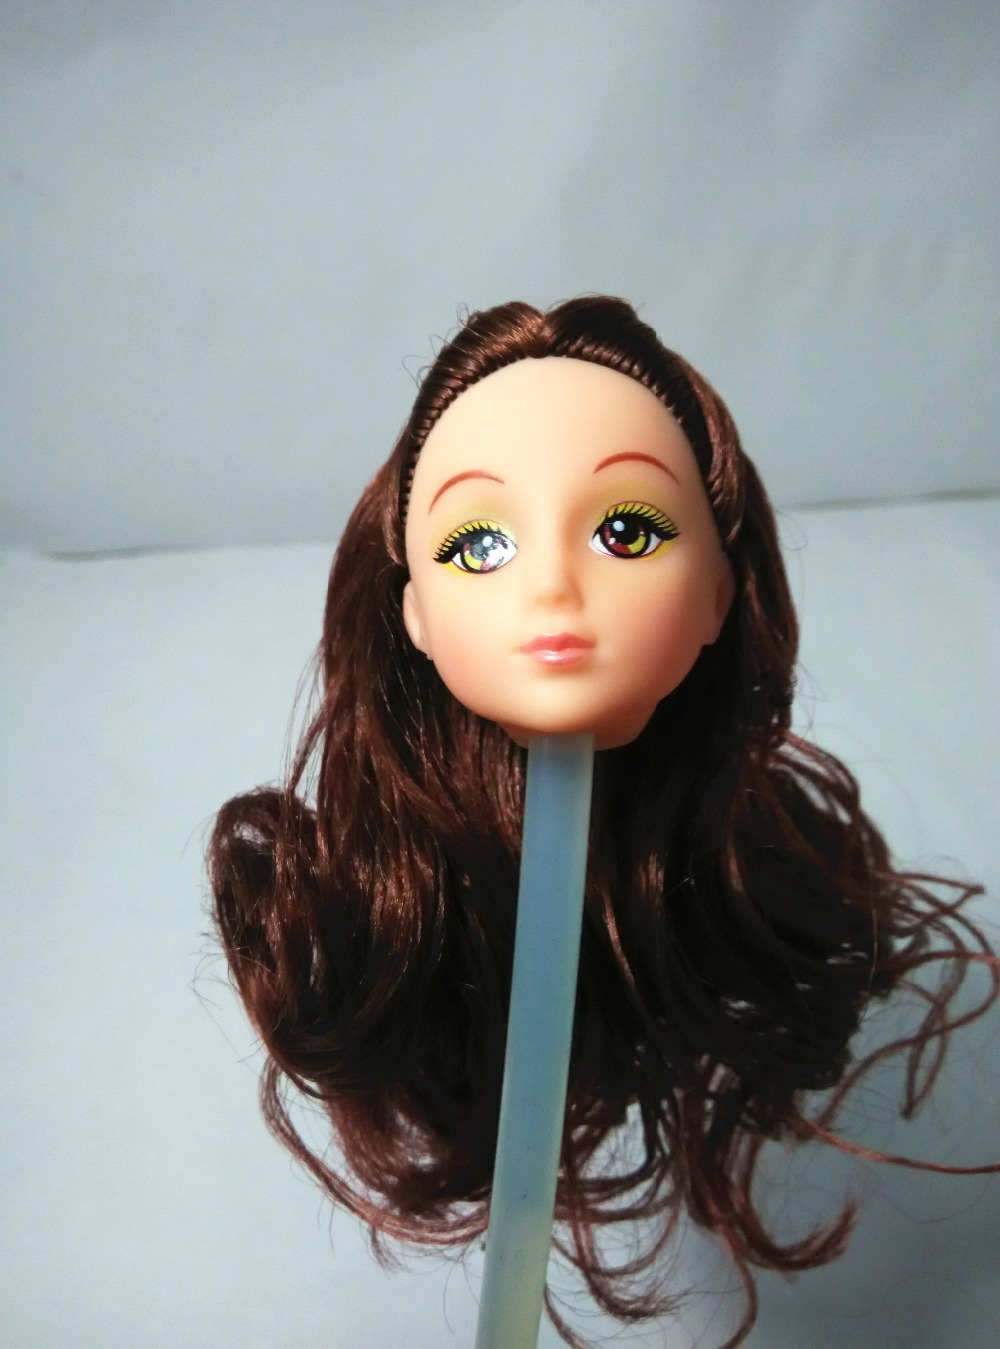 One Pcs Doll Equipment High quality Doll Head with Lengthy Hair DIY Equipment For Barbie Kurhn Doll Cute Hair type Women' Present